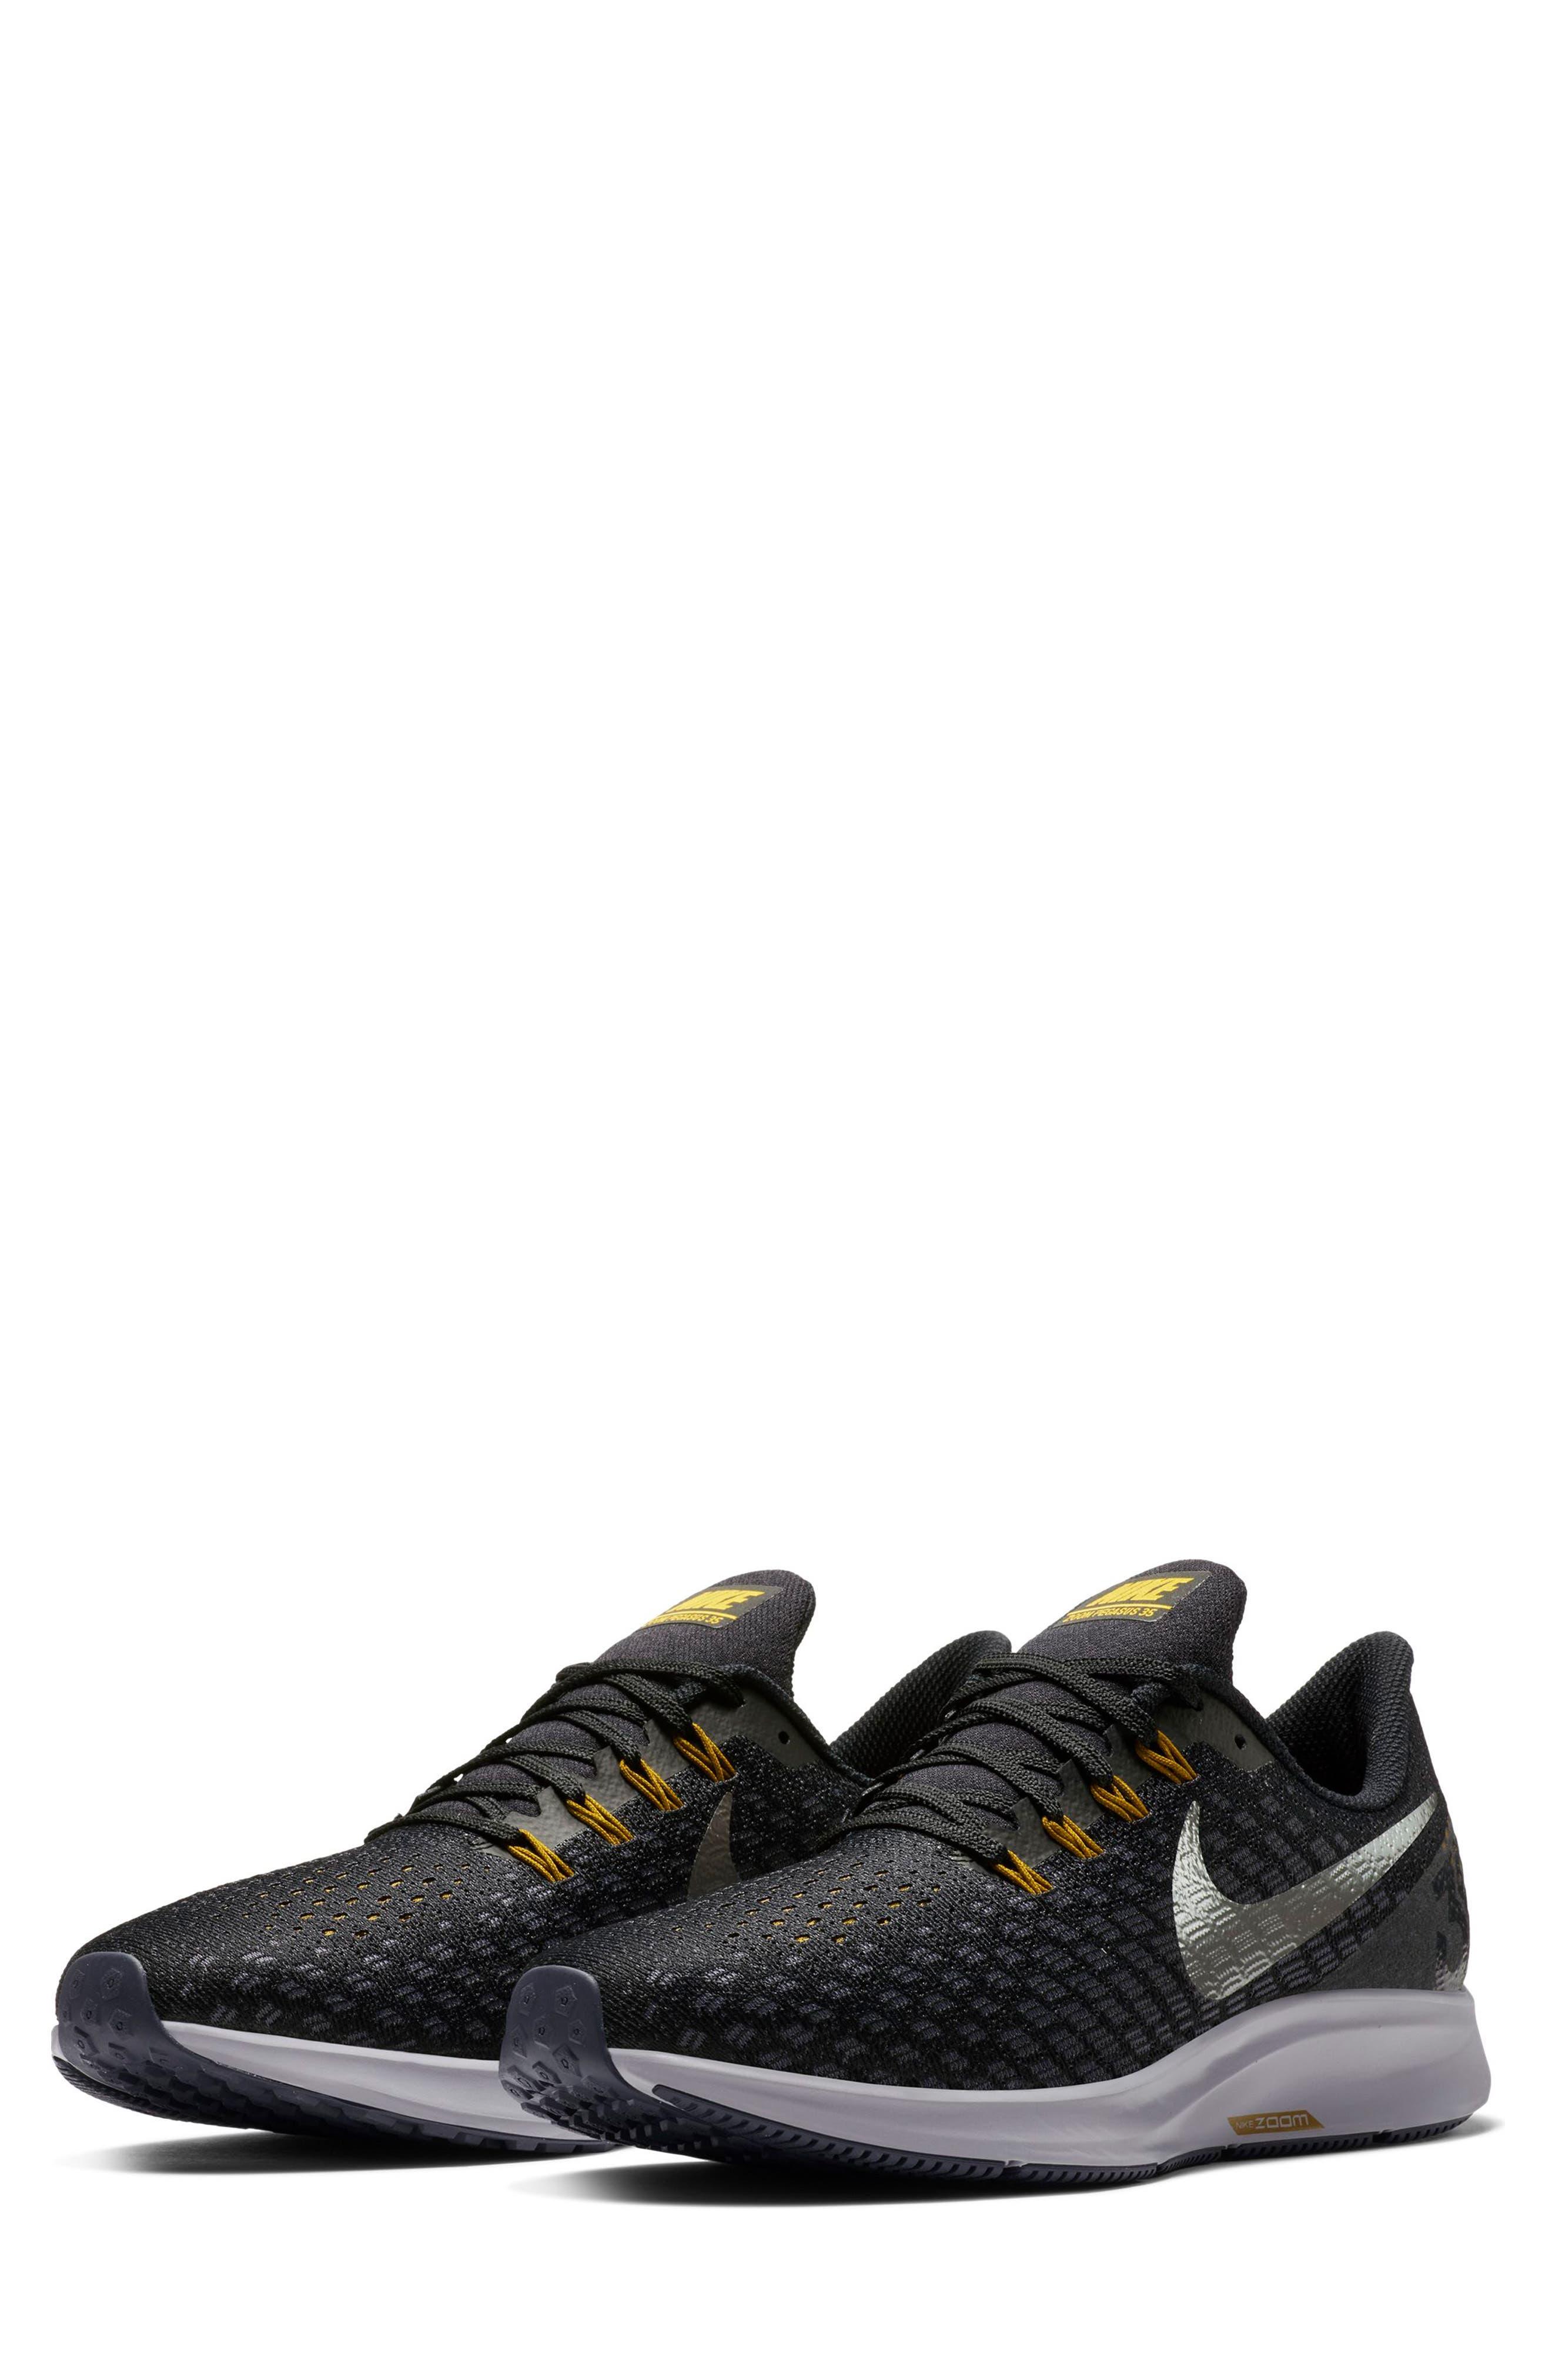 Air Zoom Pegasus 35 Running Shoe,                         Main,                         color, BLACK/ PEWTER/ MOSS